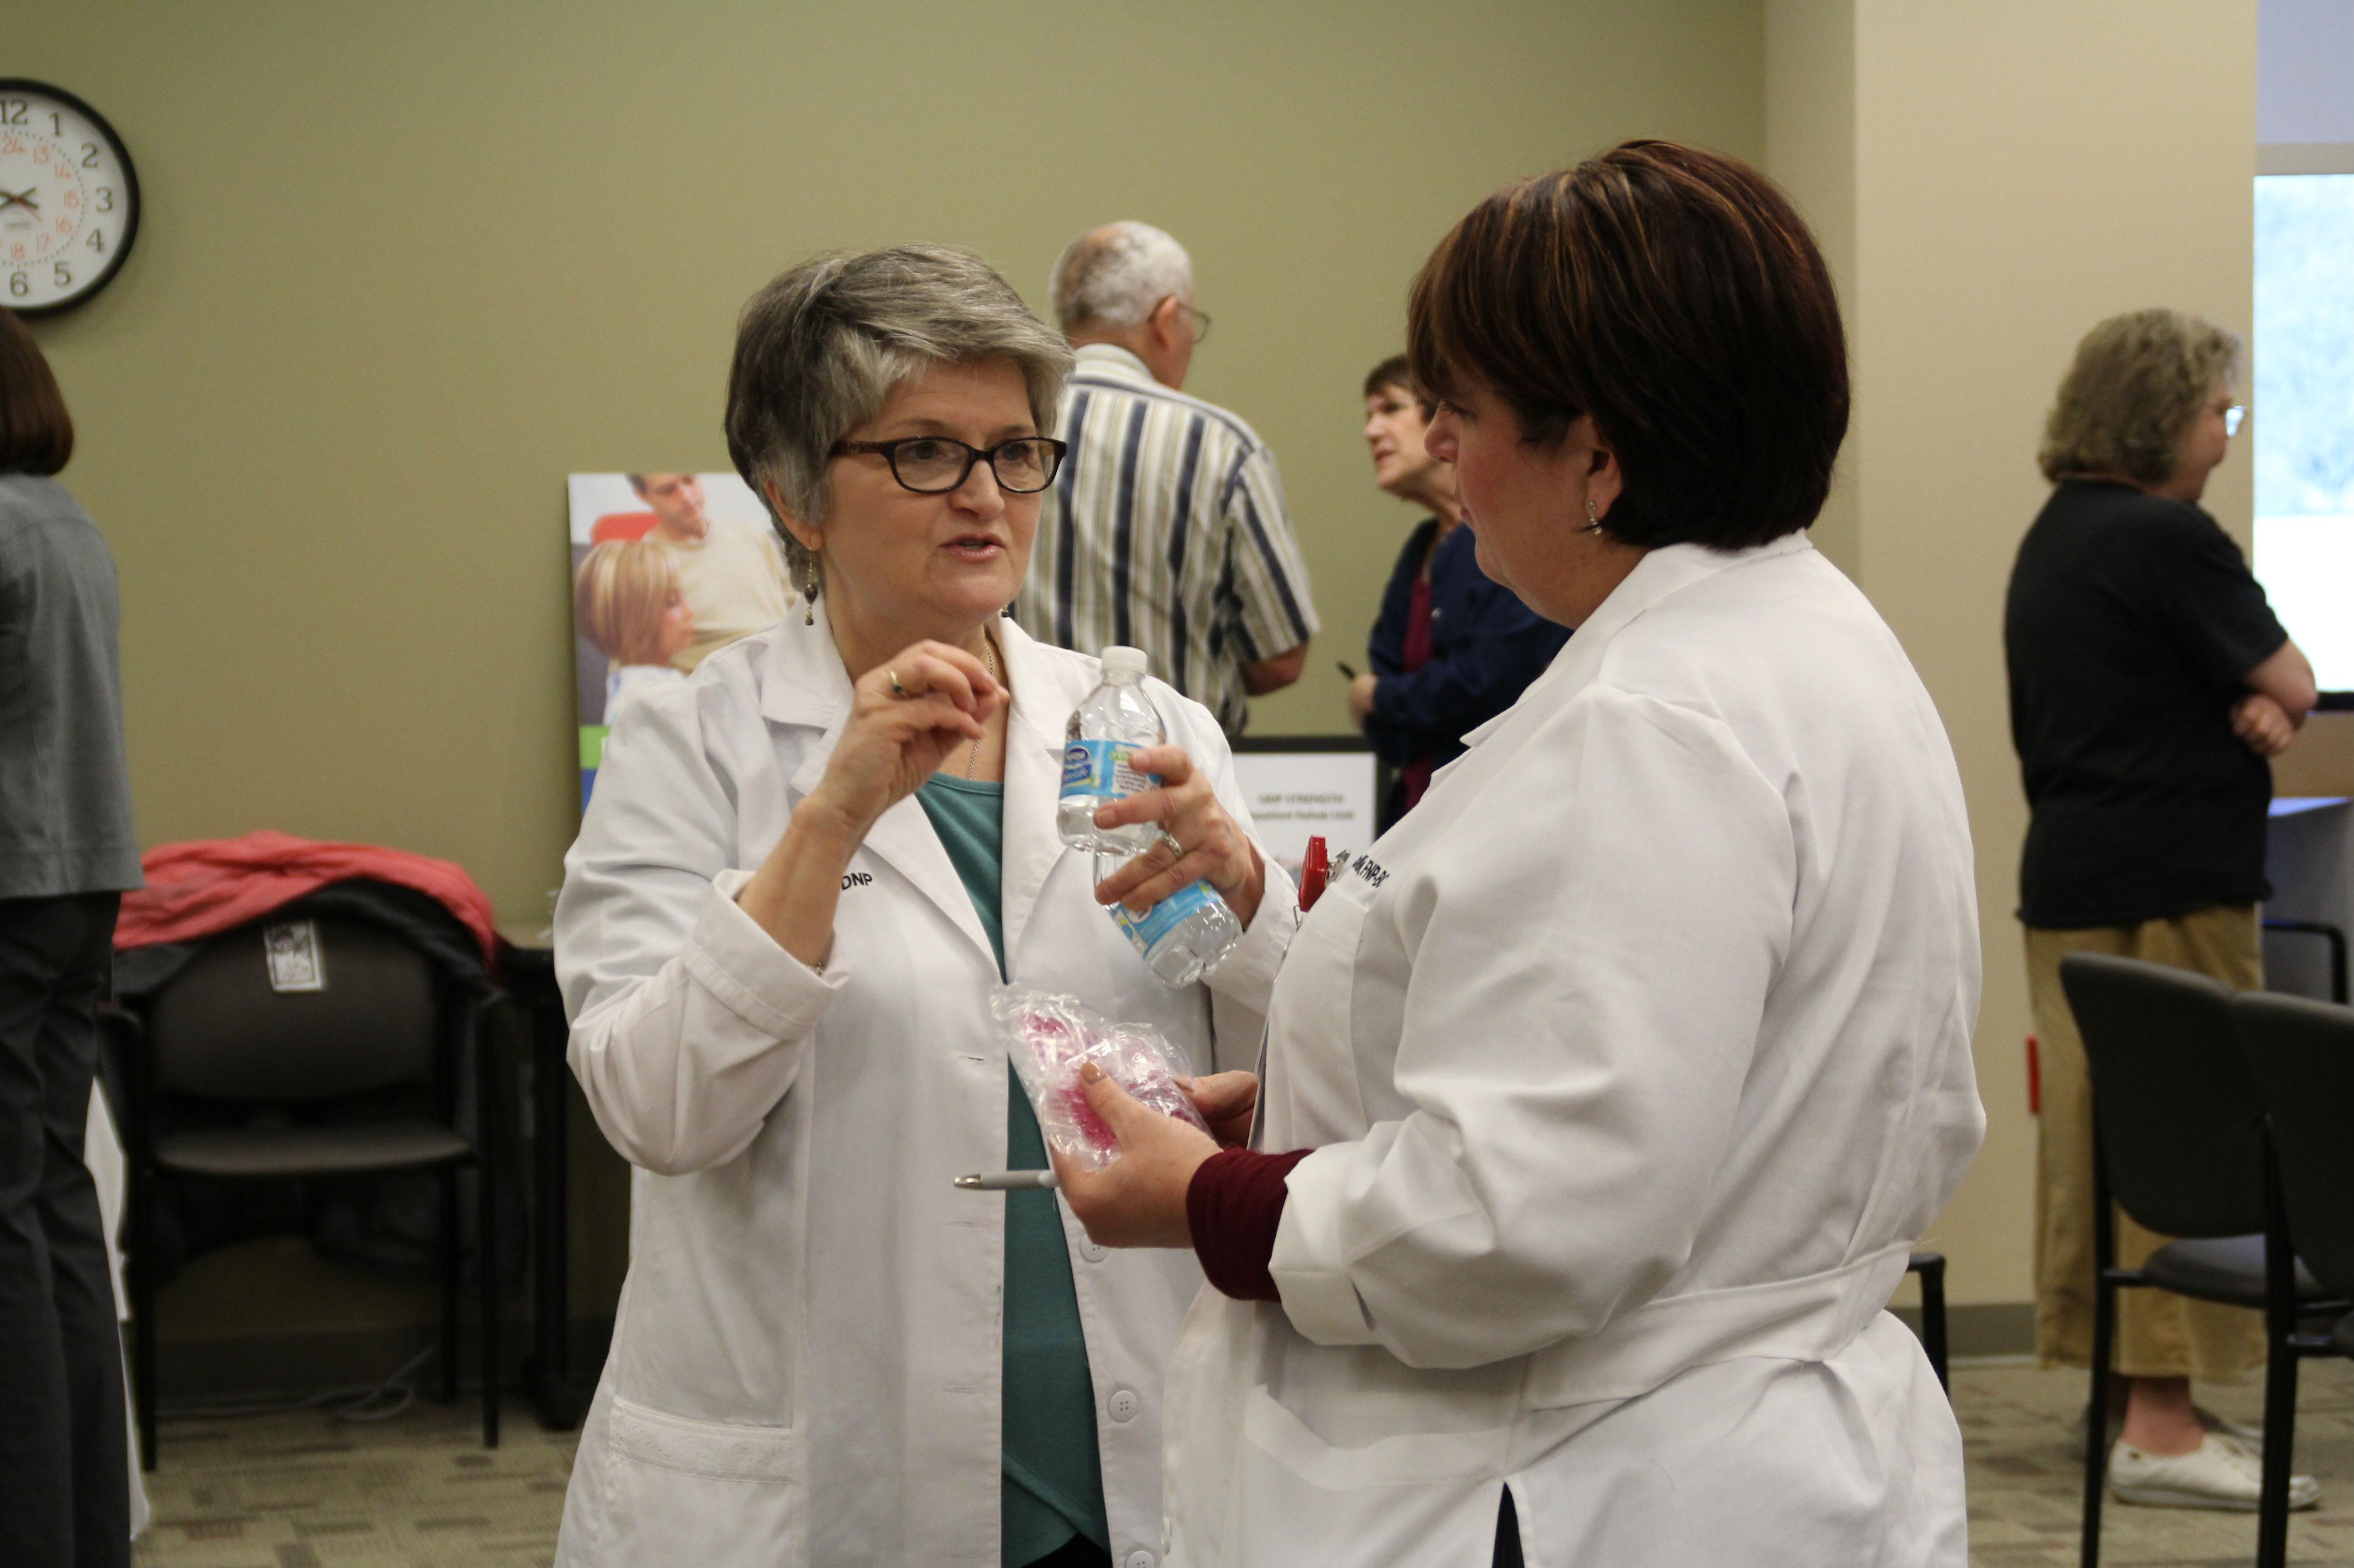 Porter Regional Hospital Hosts 2015 Spring Wellness Fair for Community Members